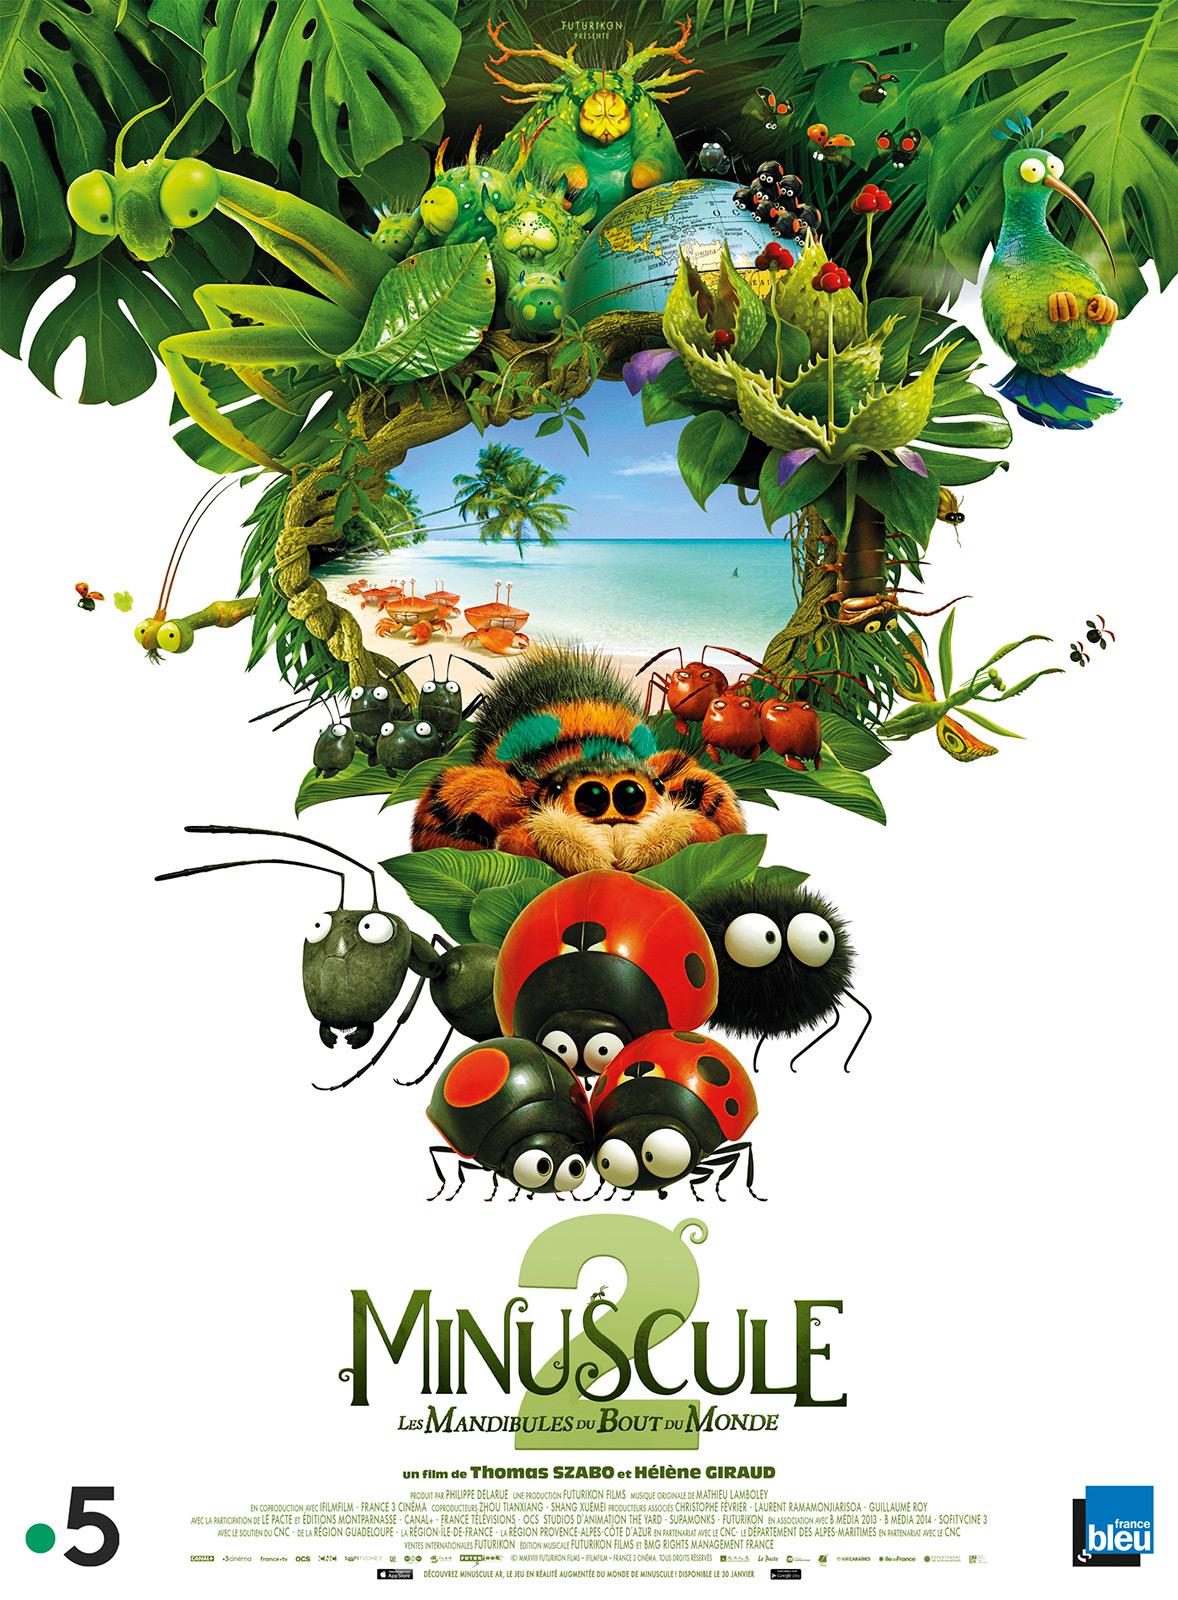 Minuscule - Mandibles from Far Away kapak